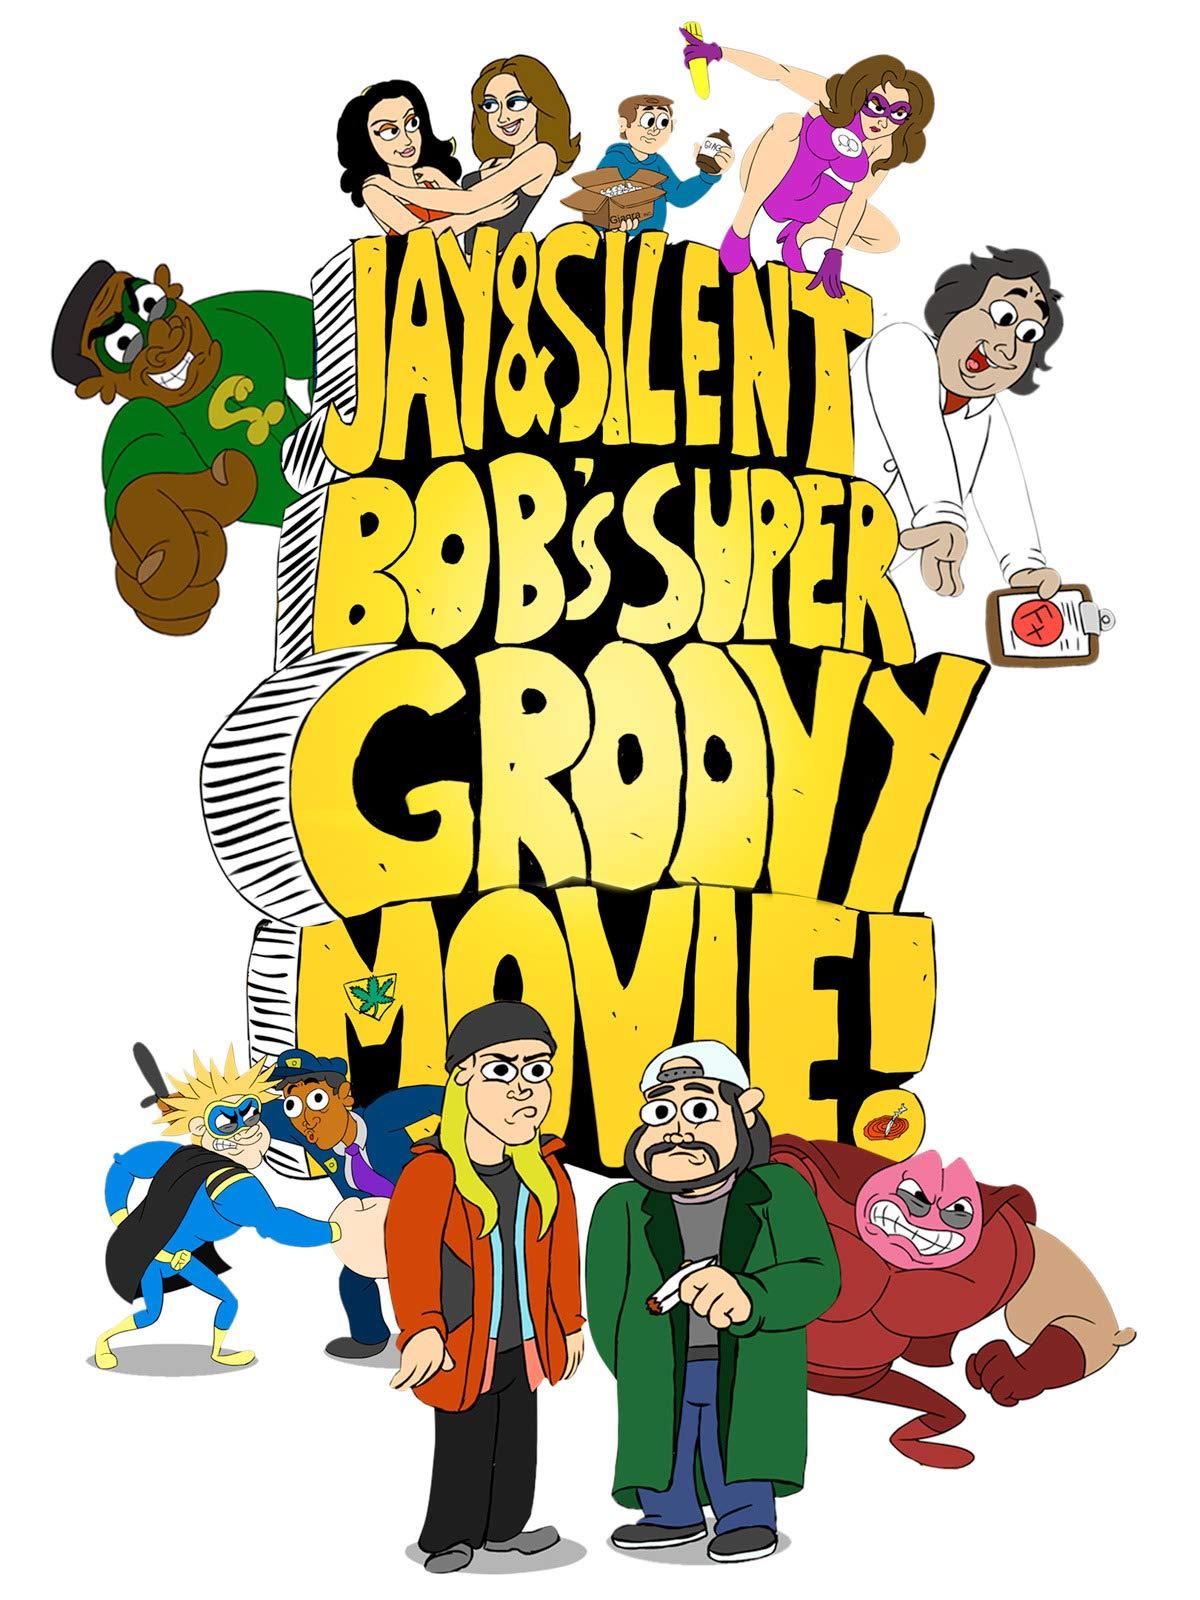 Jay & Silent Bob's Super Groovy Cartoon Movie!